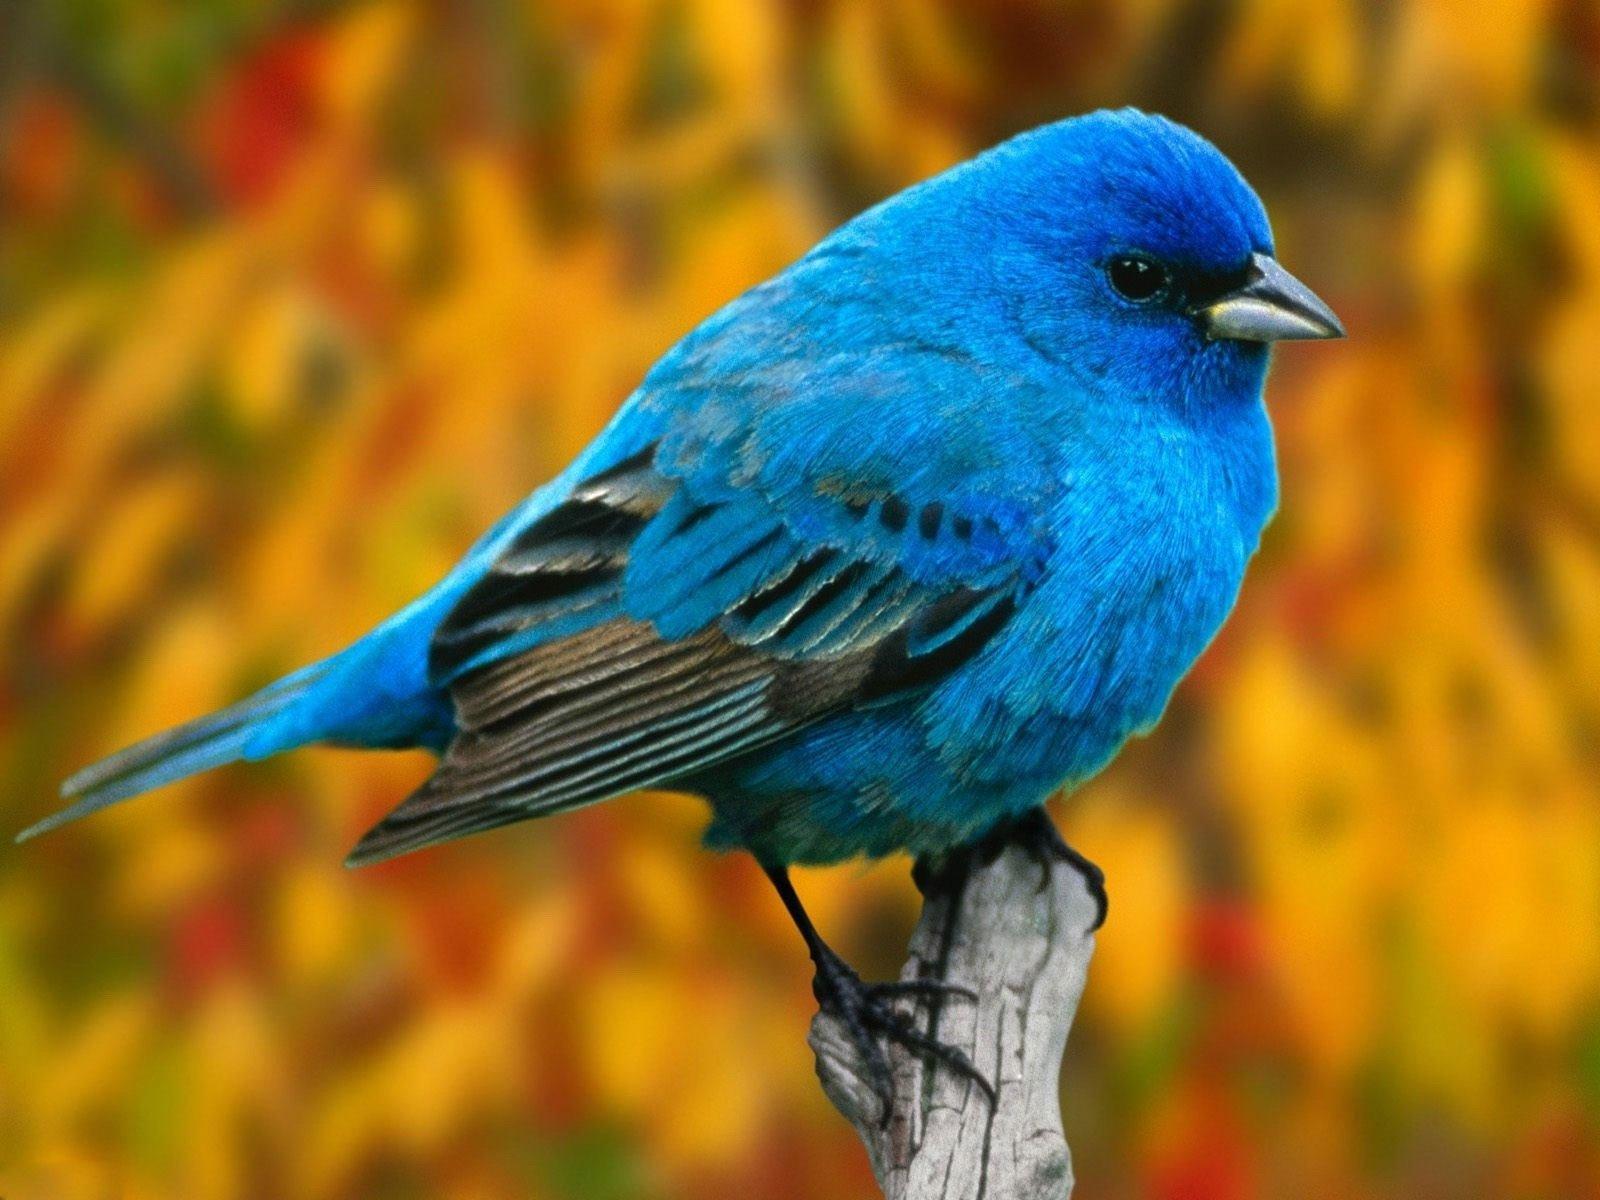 Small Parrot Parrot Birds Birds Color Birds We Love Nature 1600x1200